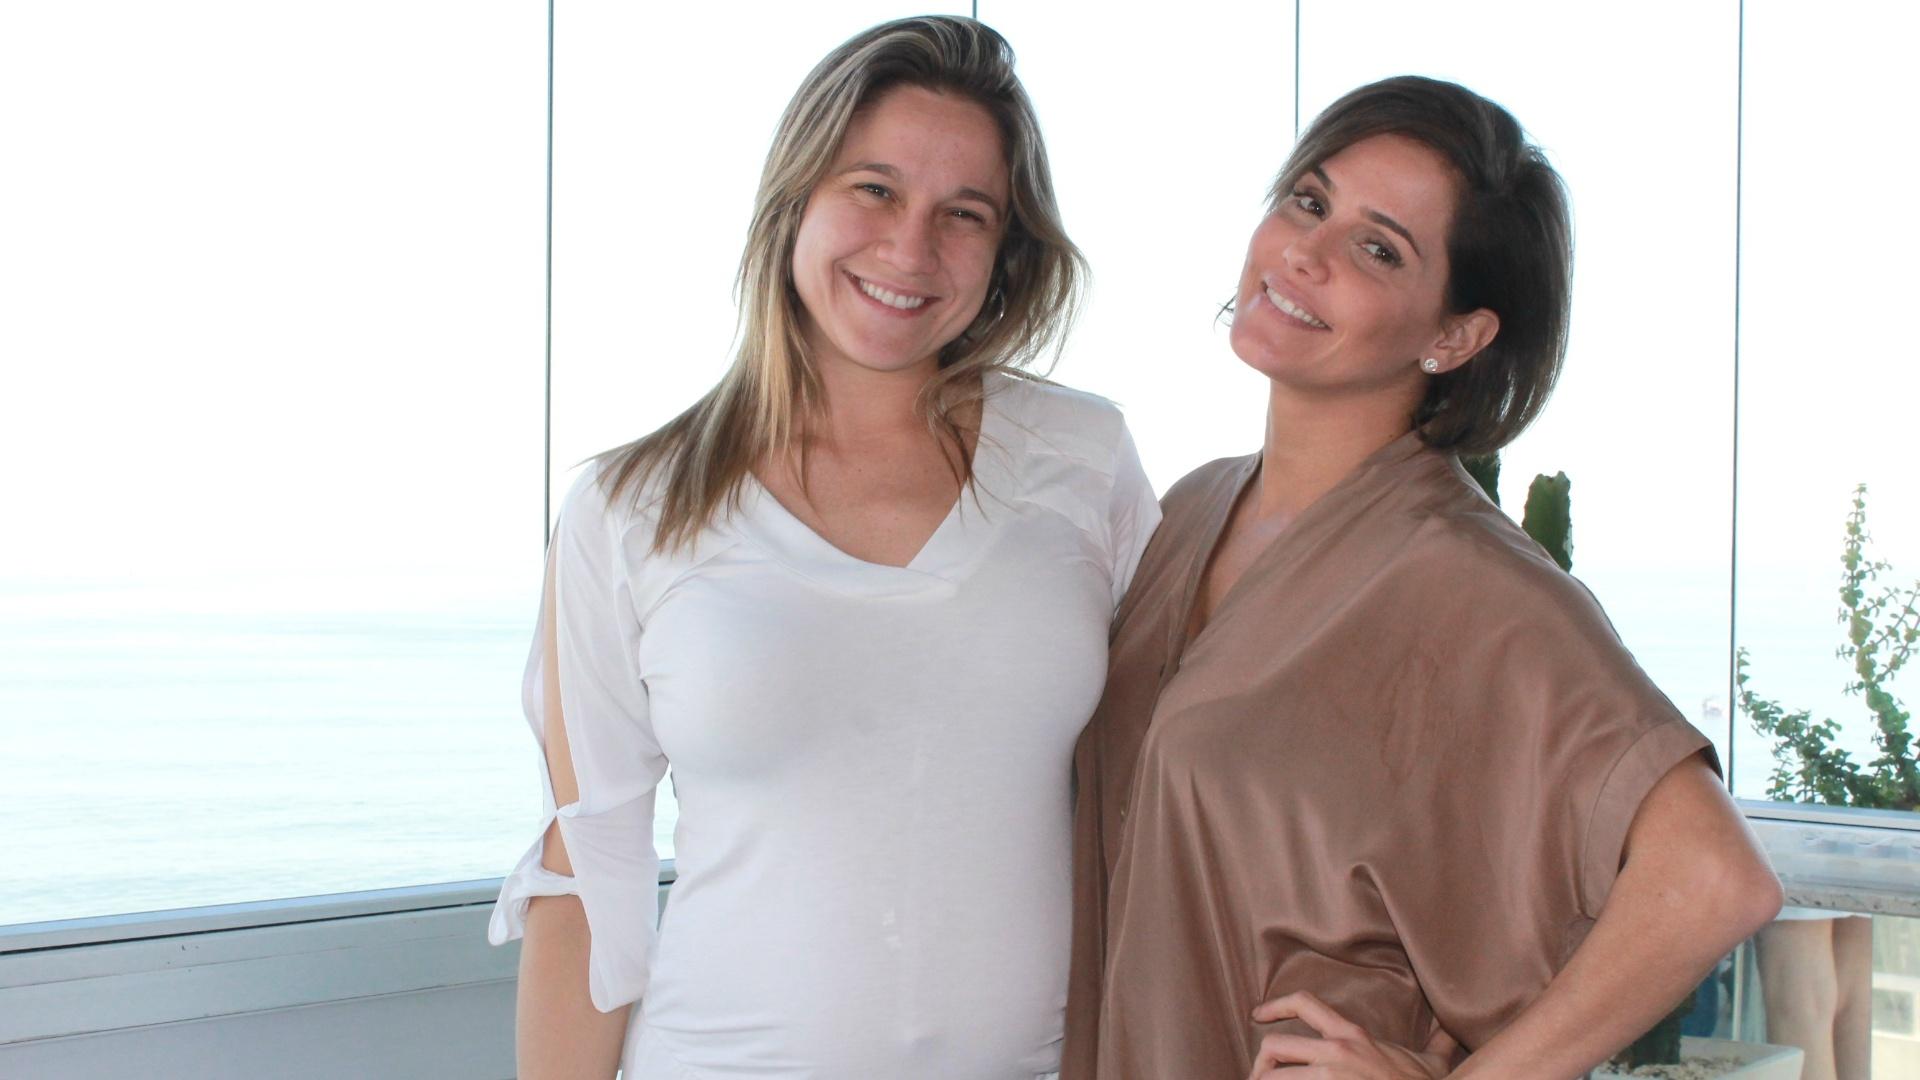 Fernanda Gentil entrevista Deborah Secco para o quadro